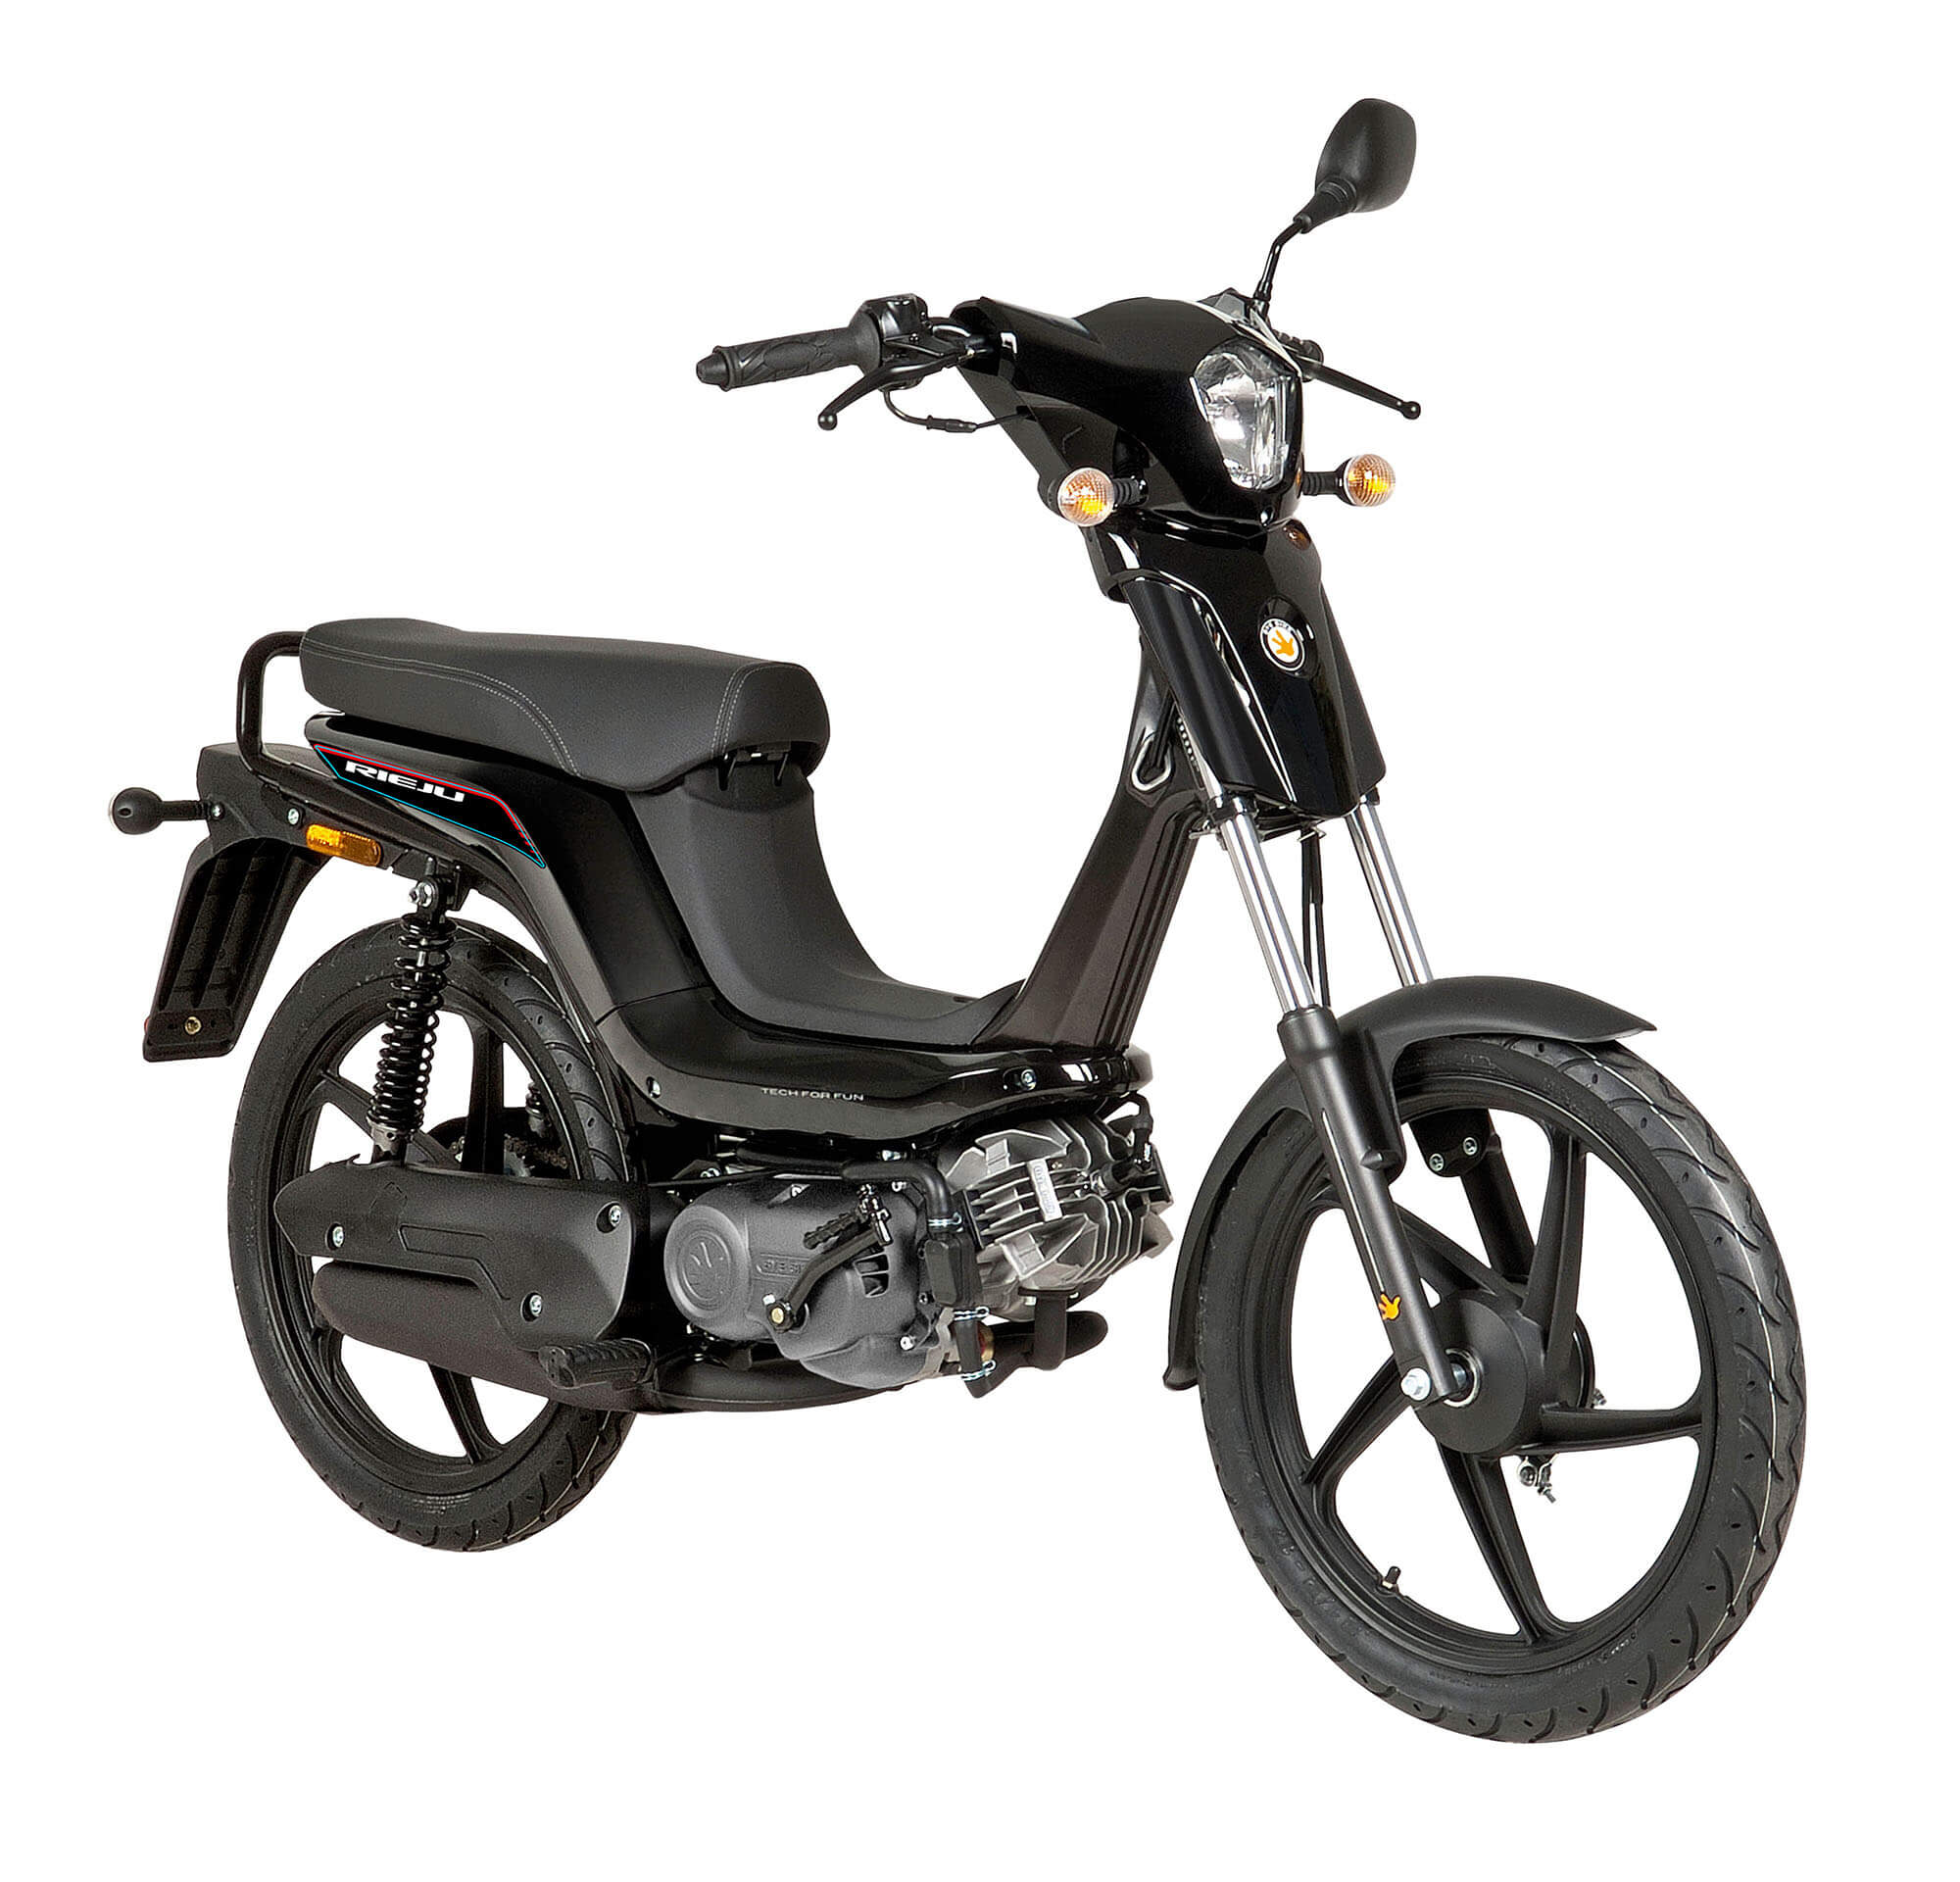 comprar-motos-rieju-bye-bike-50-negro-motissimo-barcelona